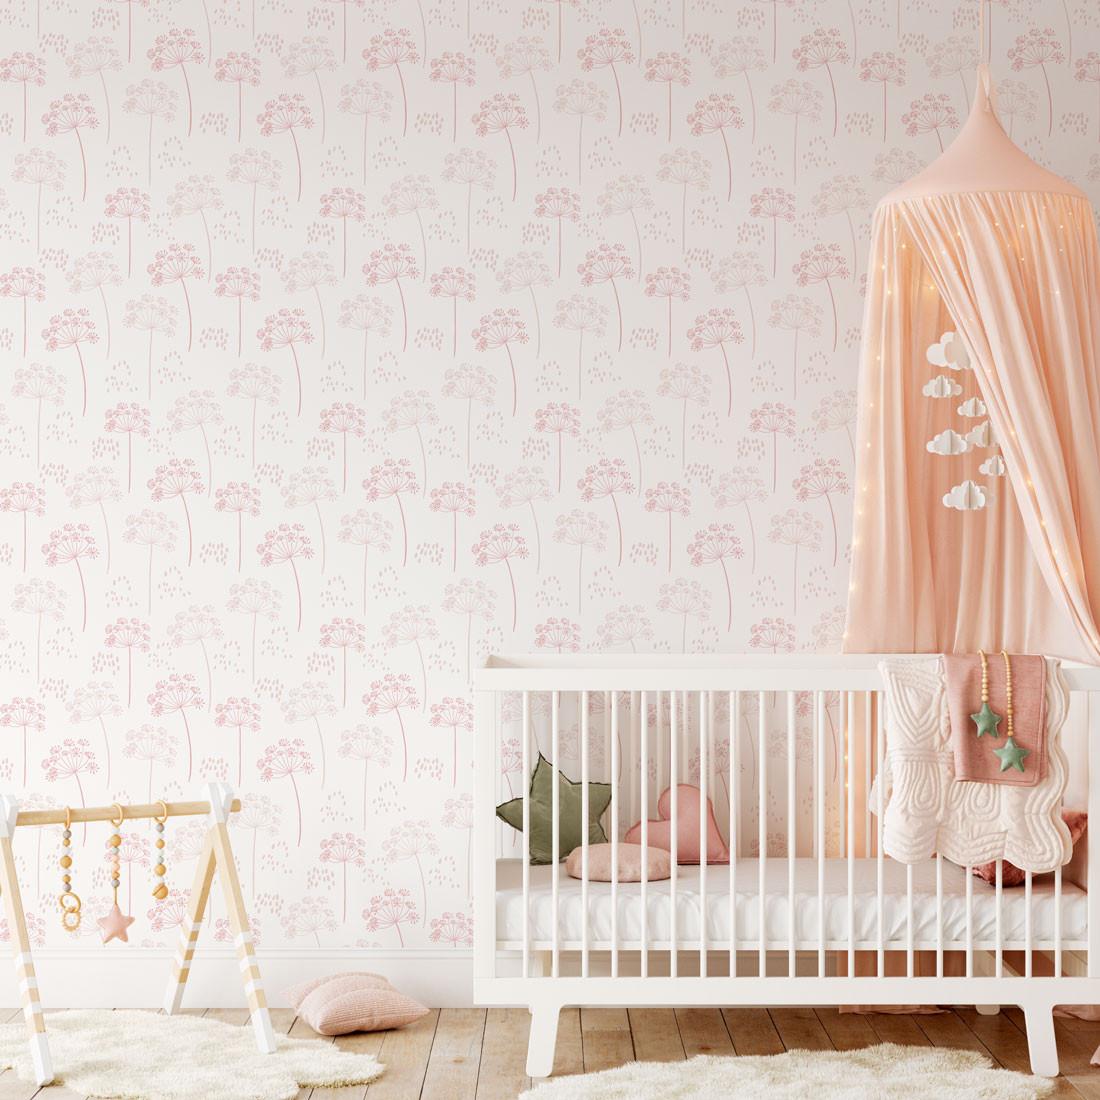 Papel De Parede Infantil Dente de Leão Tons de Rosa Bebê